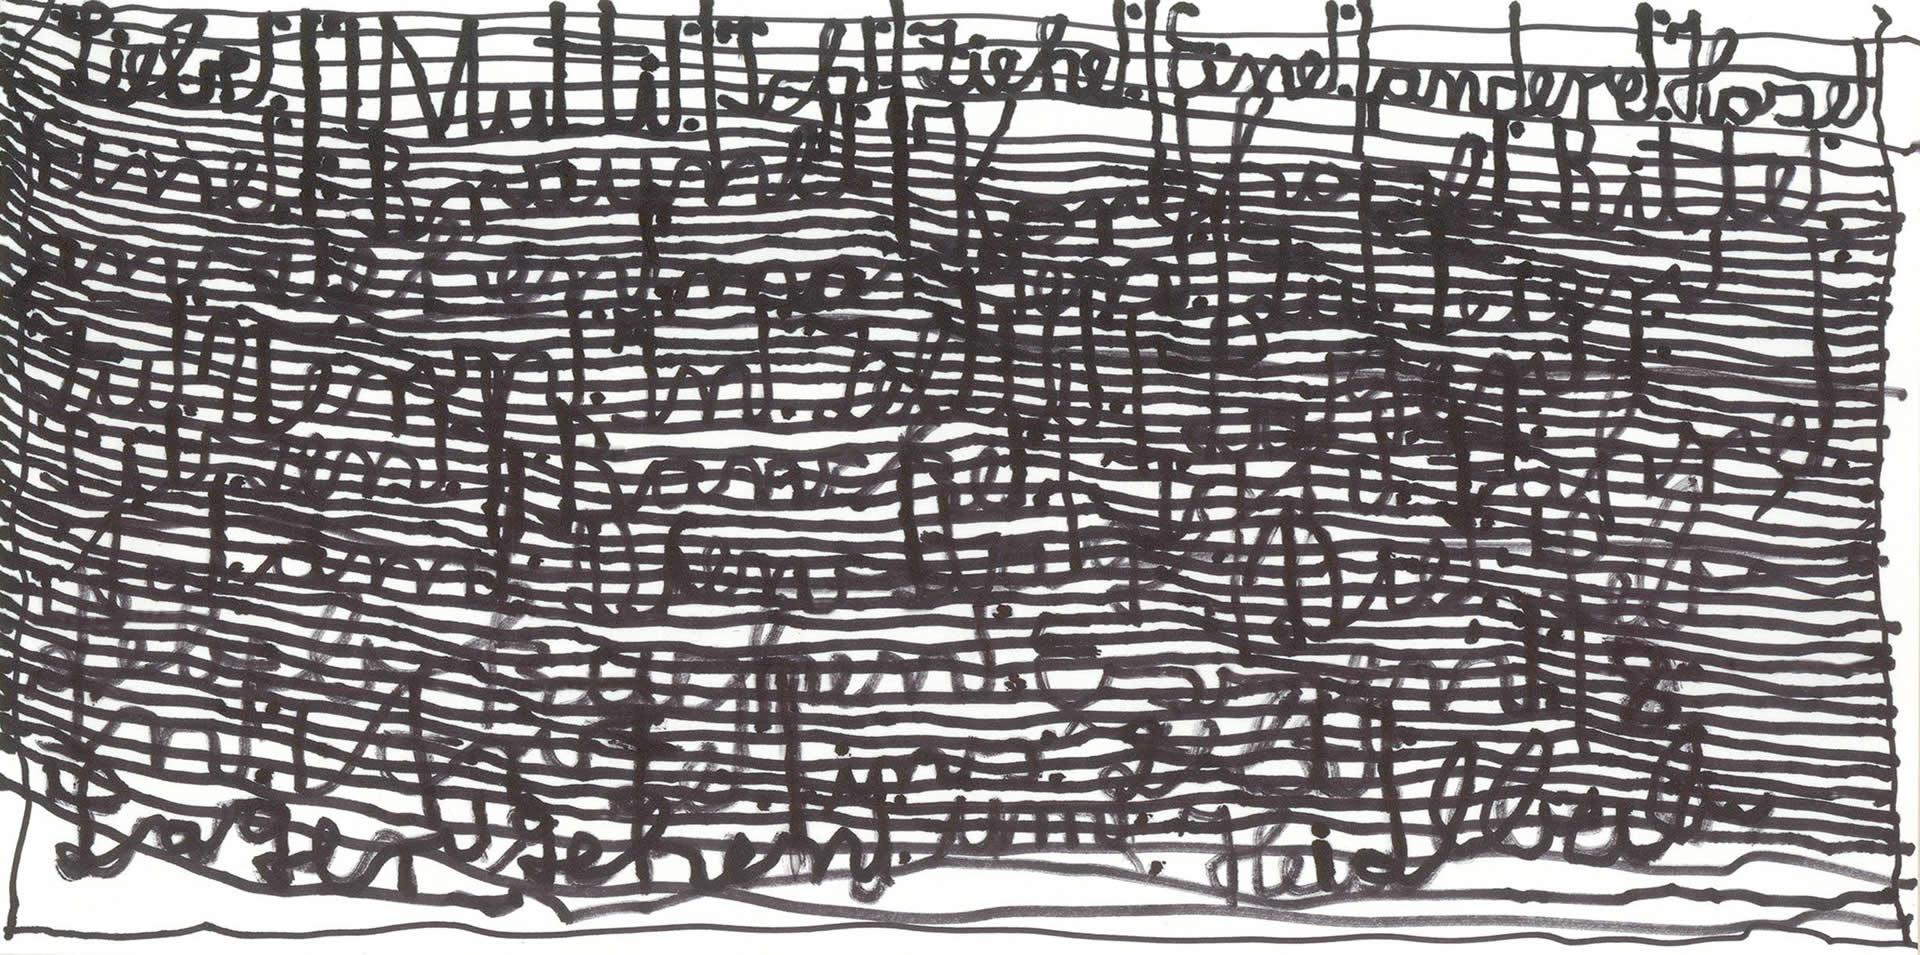 Harald Stoffers | Brief277 2013 | 15x29,5cm | viennacontemporary | Galerie3